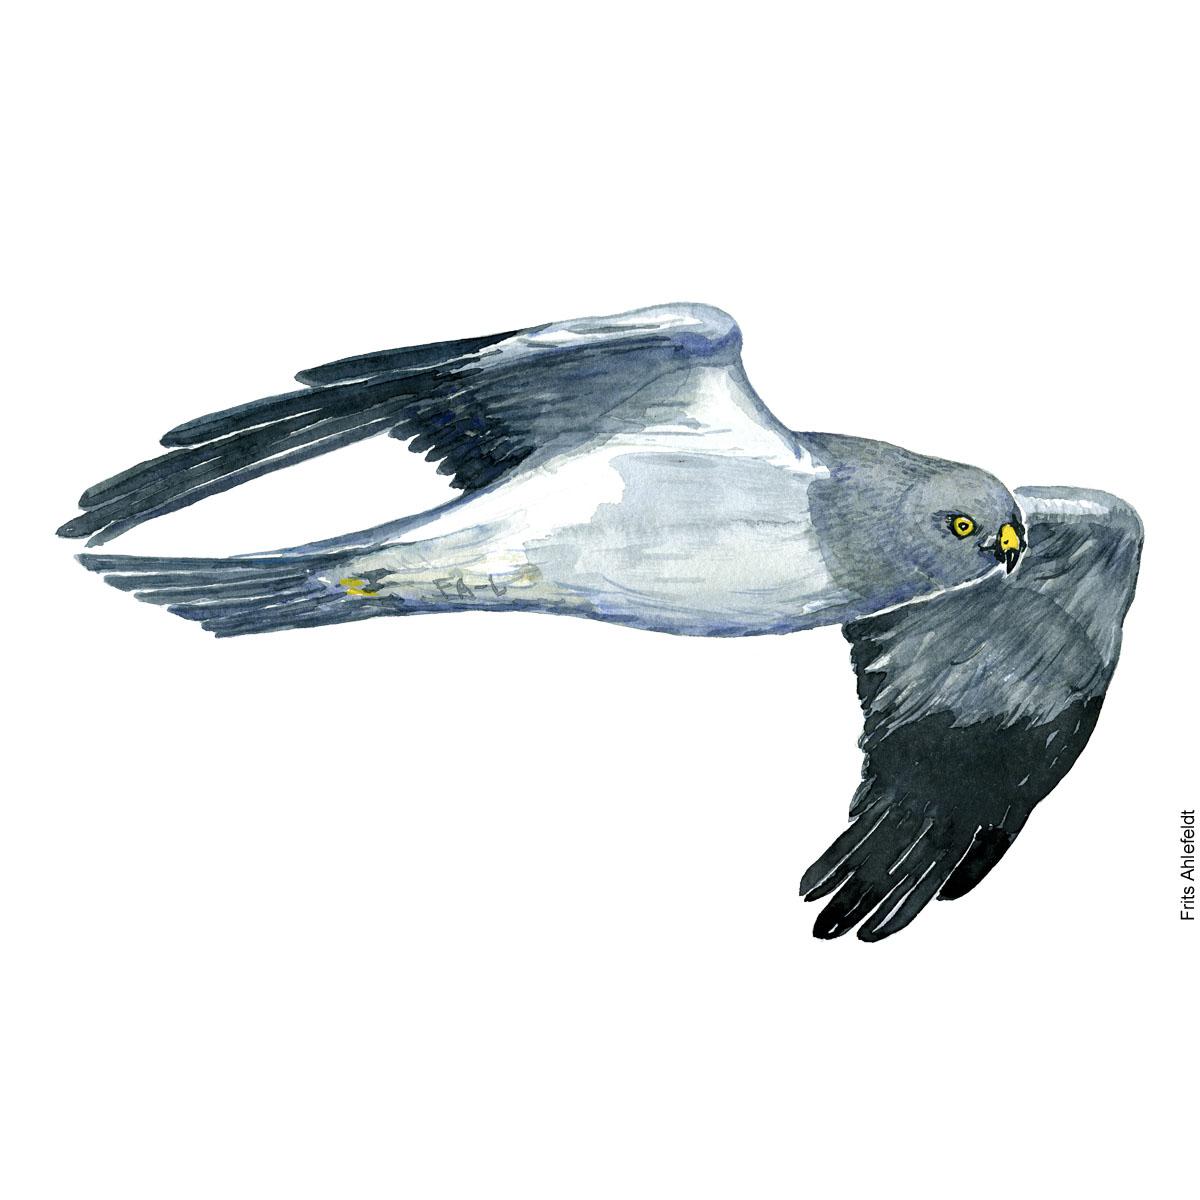 Blaa kaerhoeg - henharrier bird watercolor. Akvarel af Frits Ahlefeldt